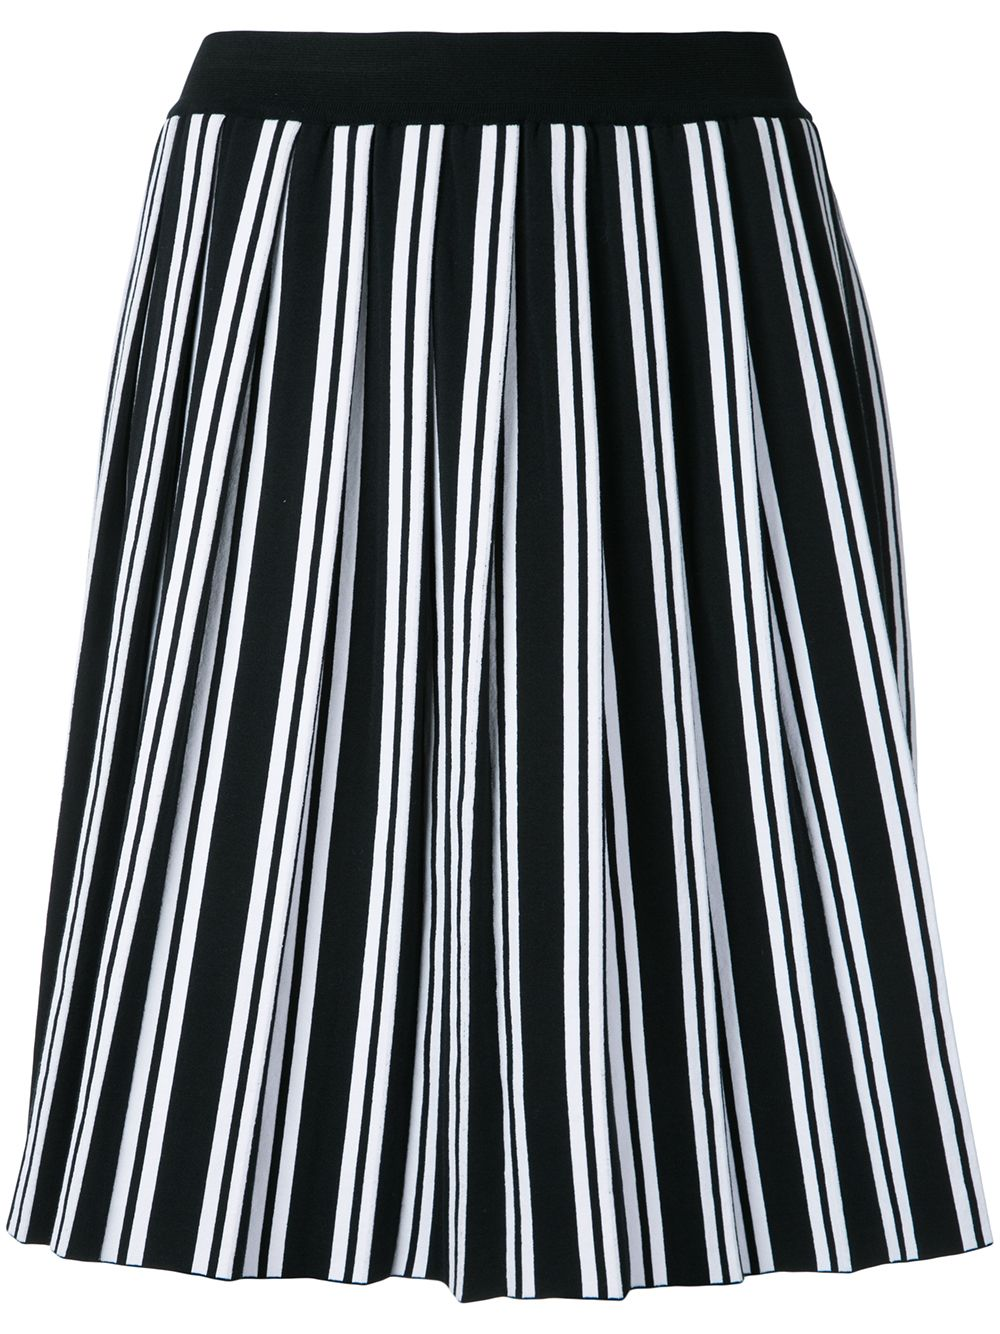 Black and white cotton striped pleated skirt BALENCIAGA |  | 456768-T31059040